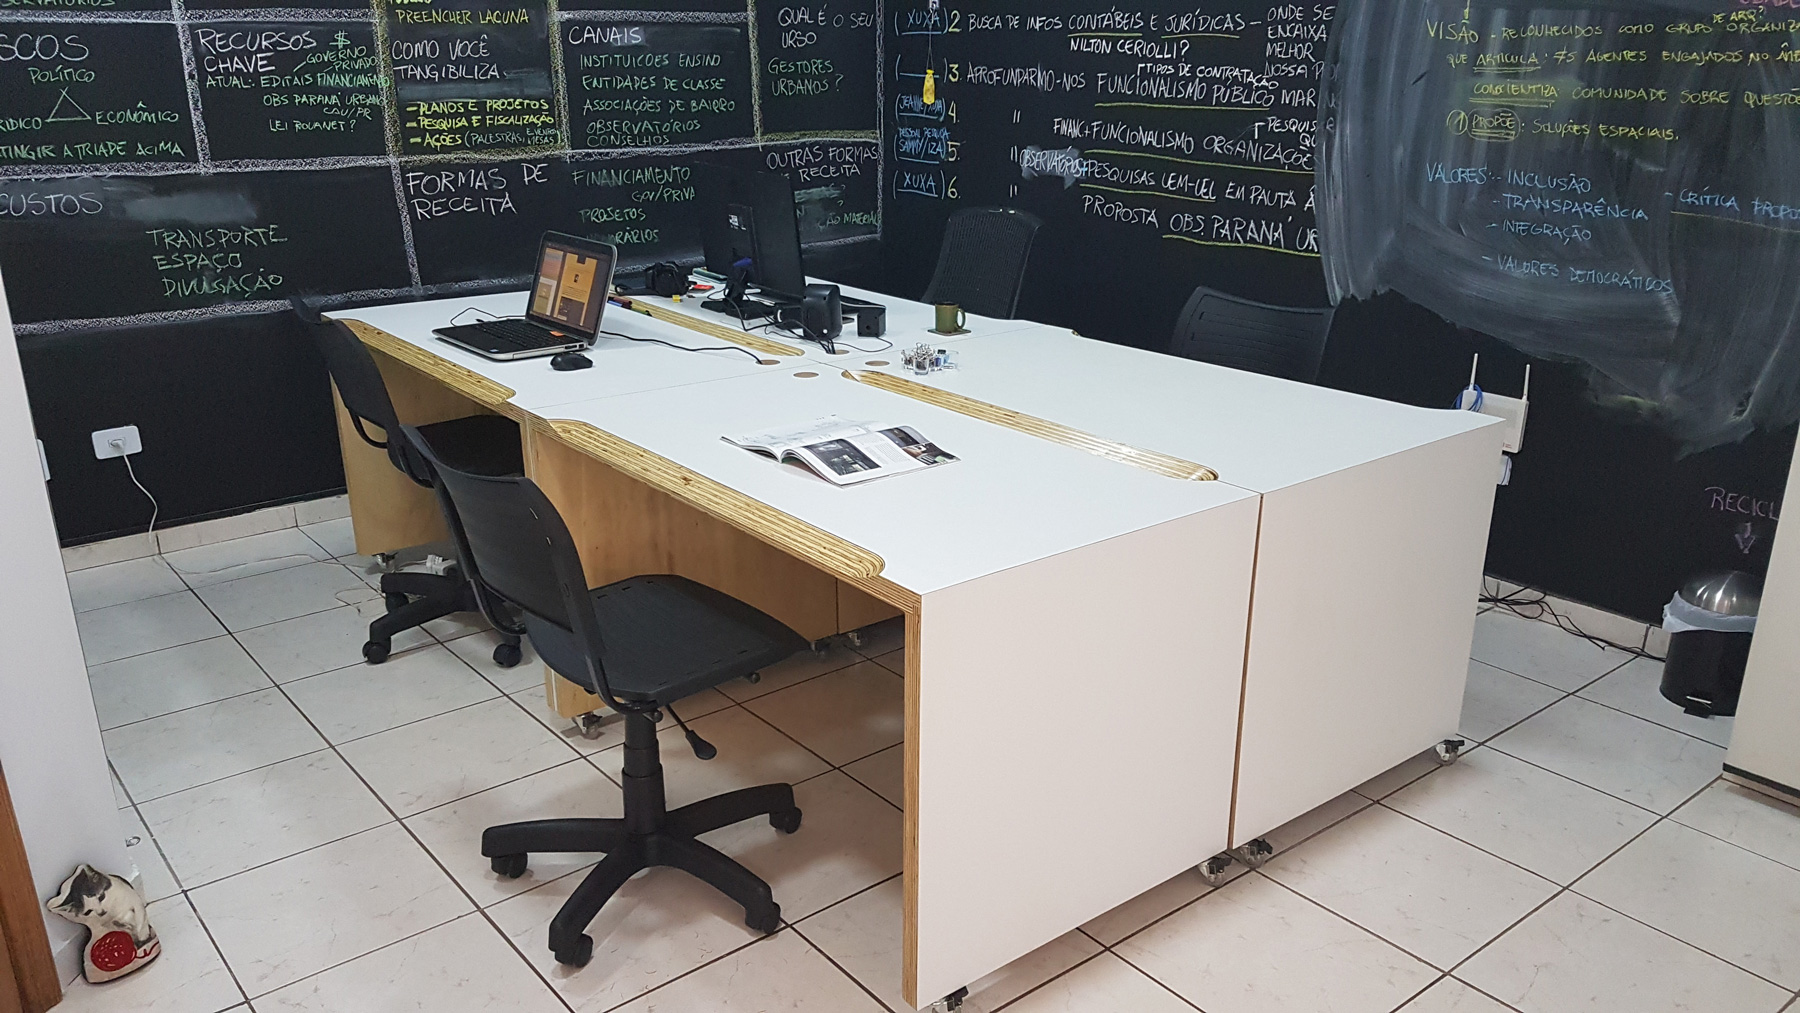 mesas-plataforma-arquitetura